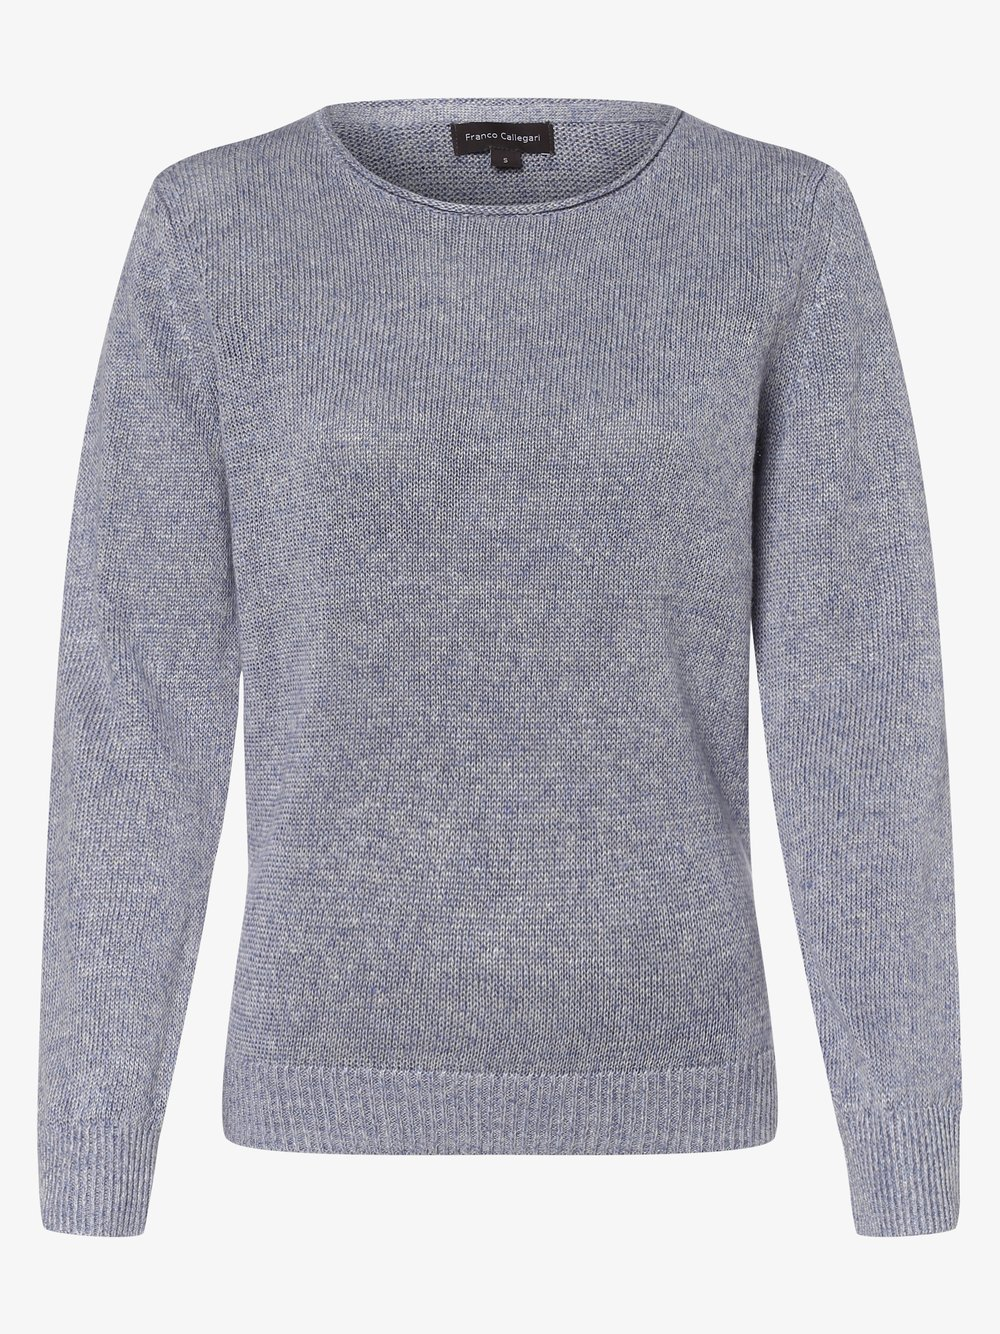 Franco Callegari - Damski sweter lniany, niebieski